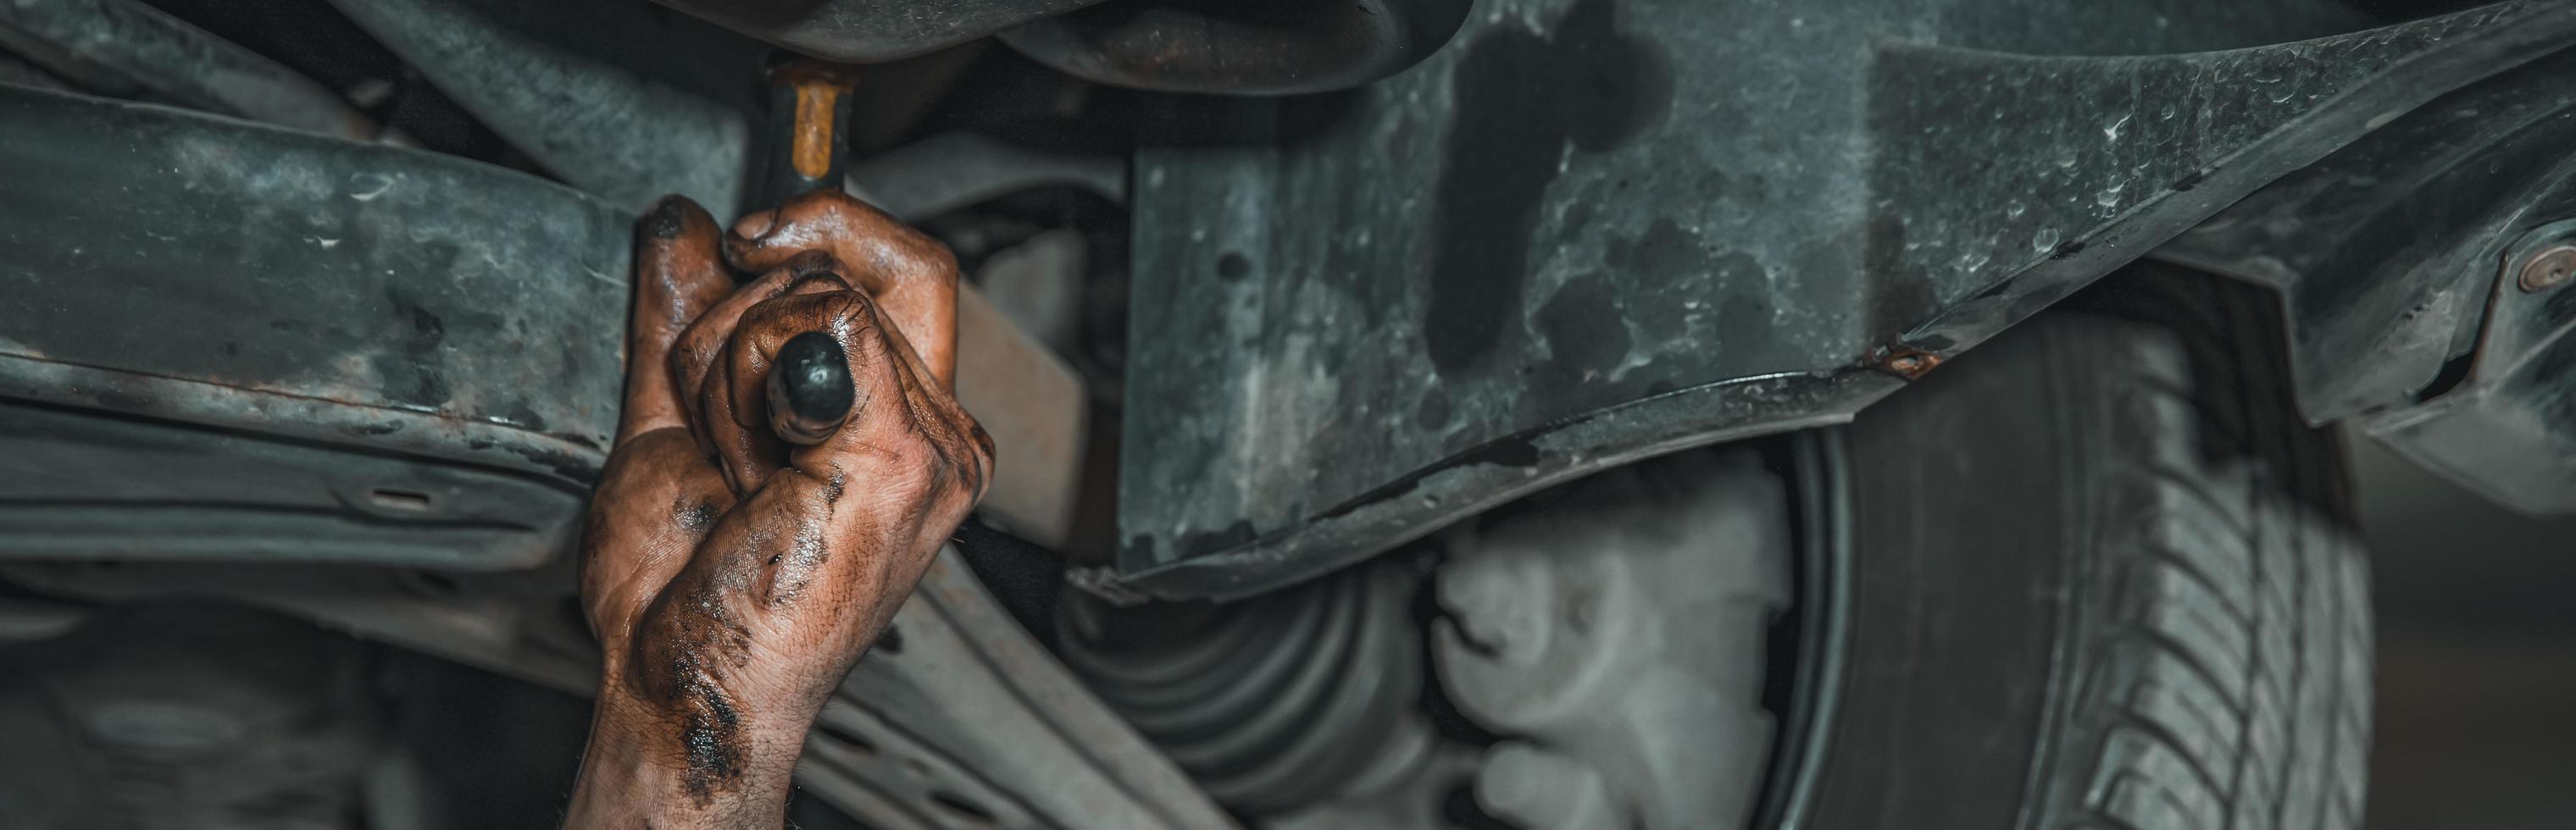 Greasy mechanic hand reaches under hood photo